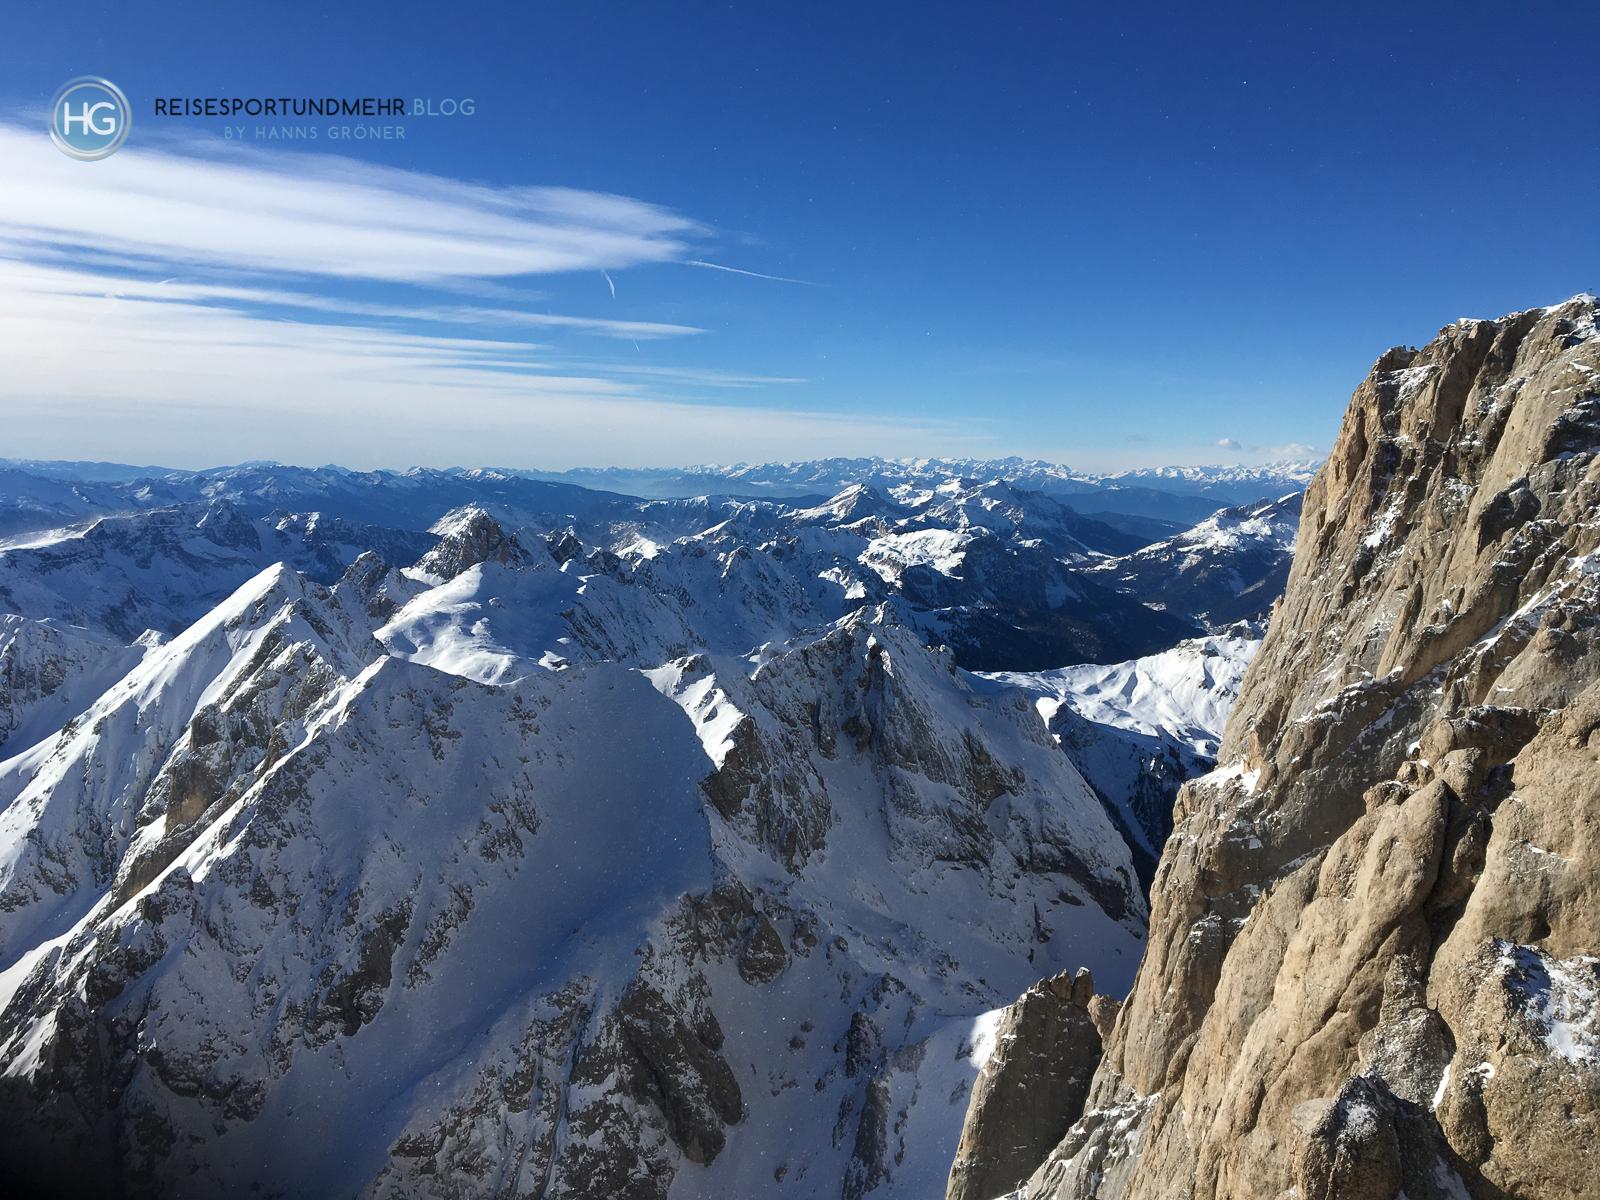 Südtirol Dezember 2018 - Marmolada (Foto: Hanns Gröner)